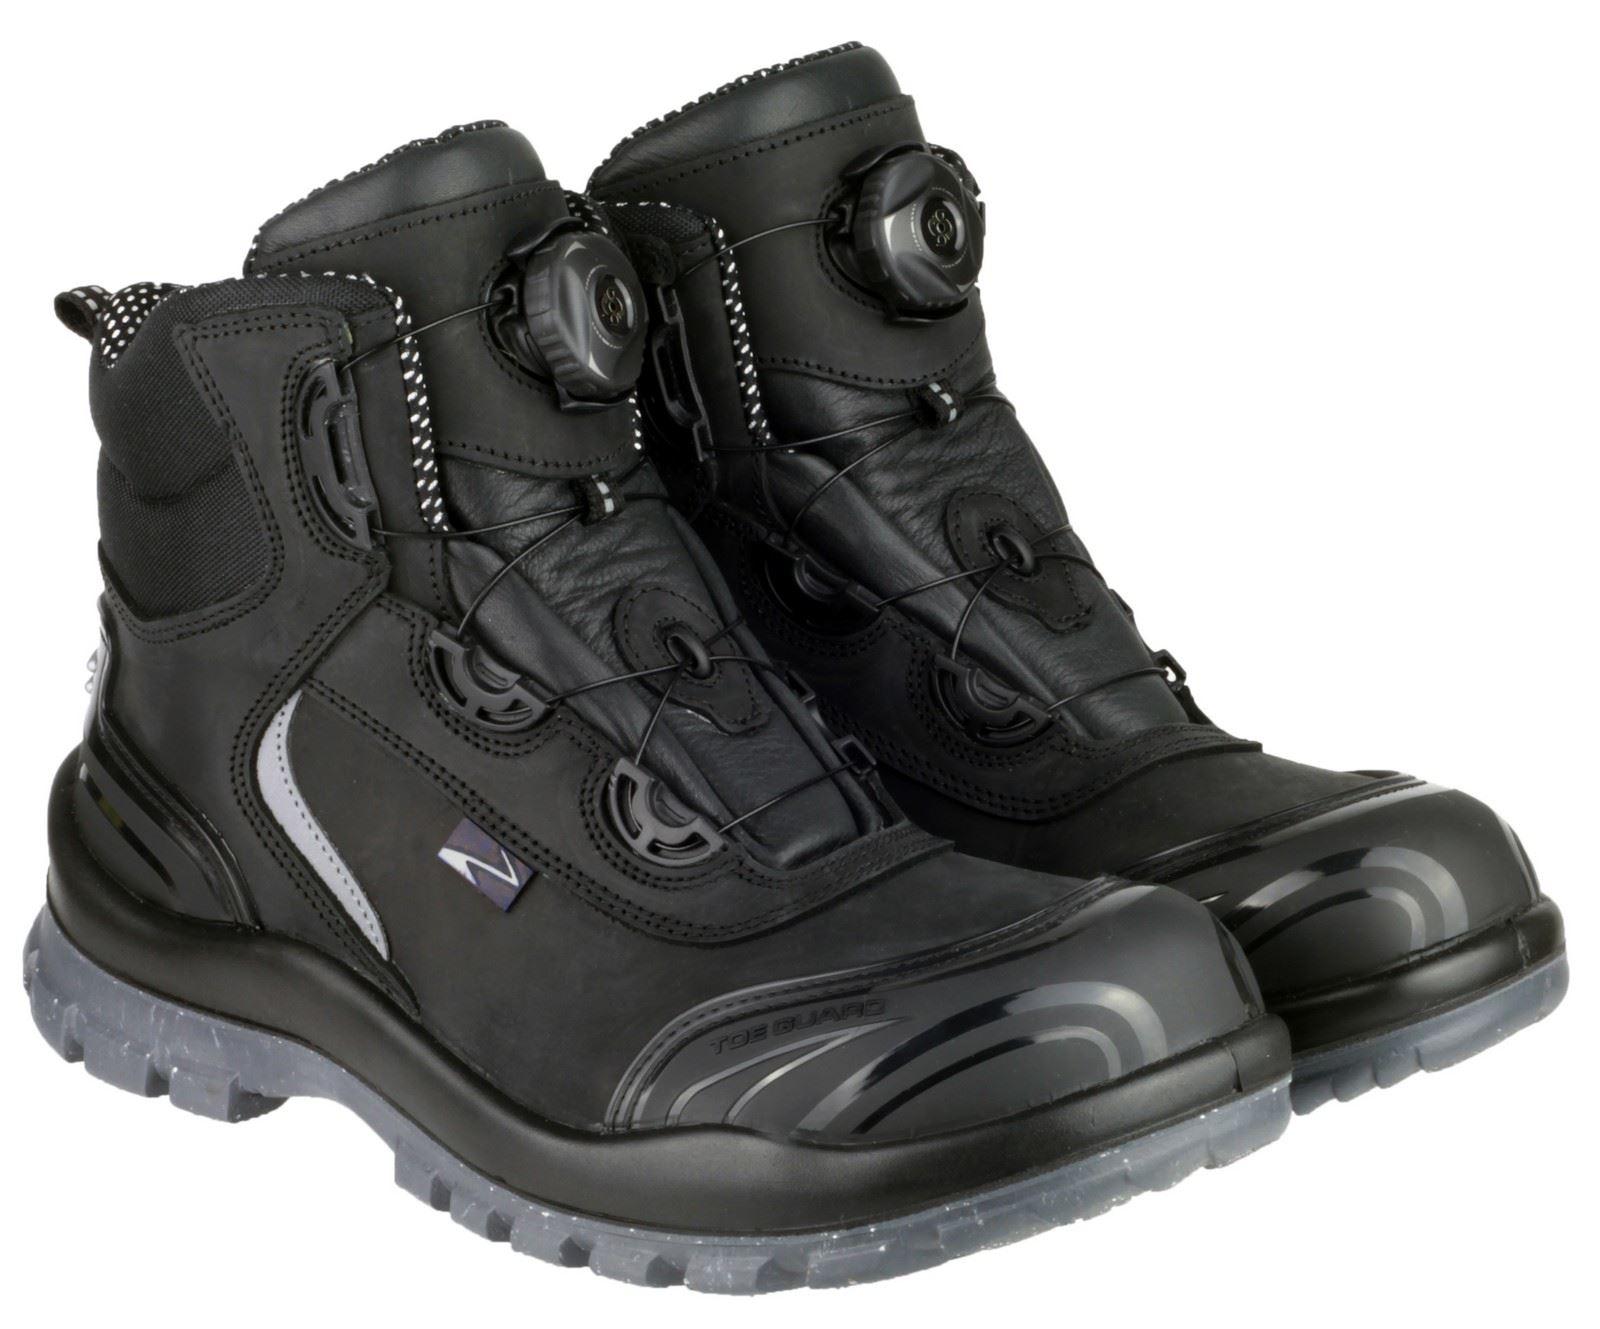 Pezzol Moonwalker Mens Safety Boots Steel Toe Cap